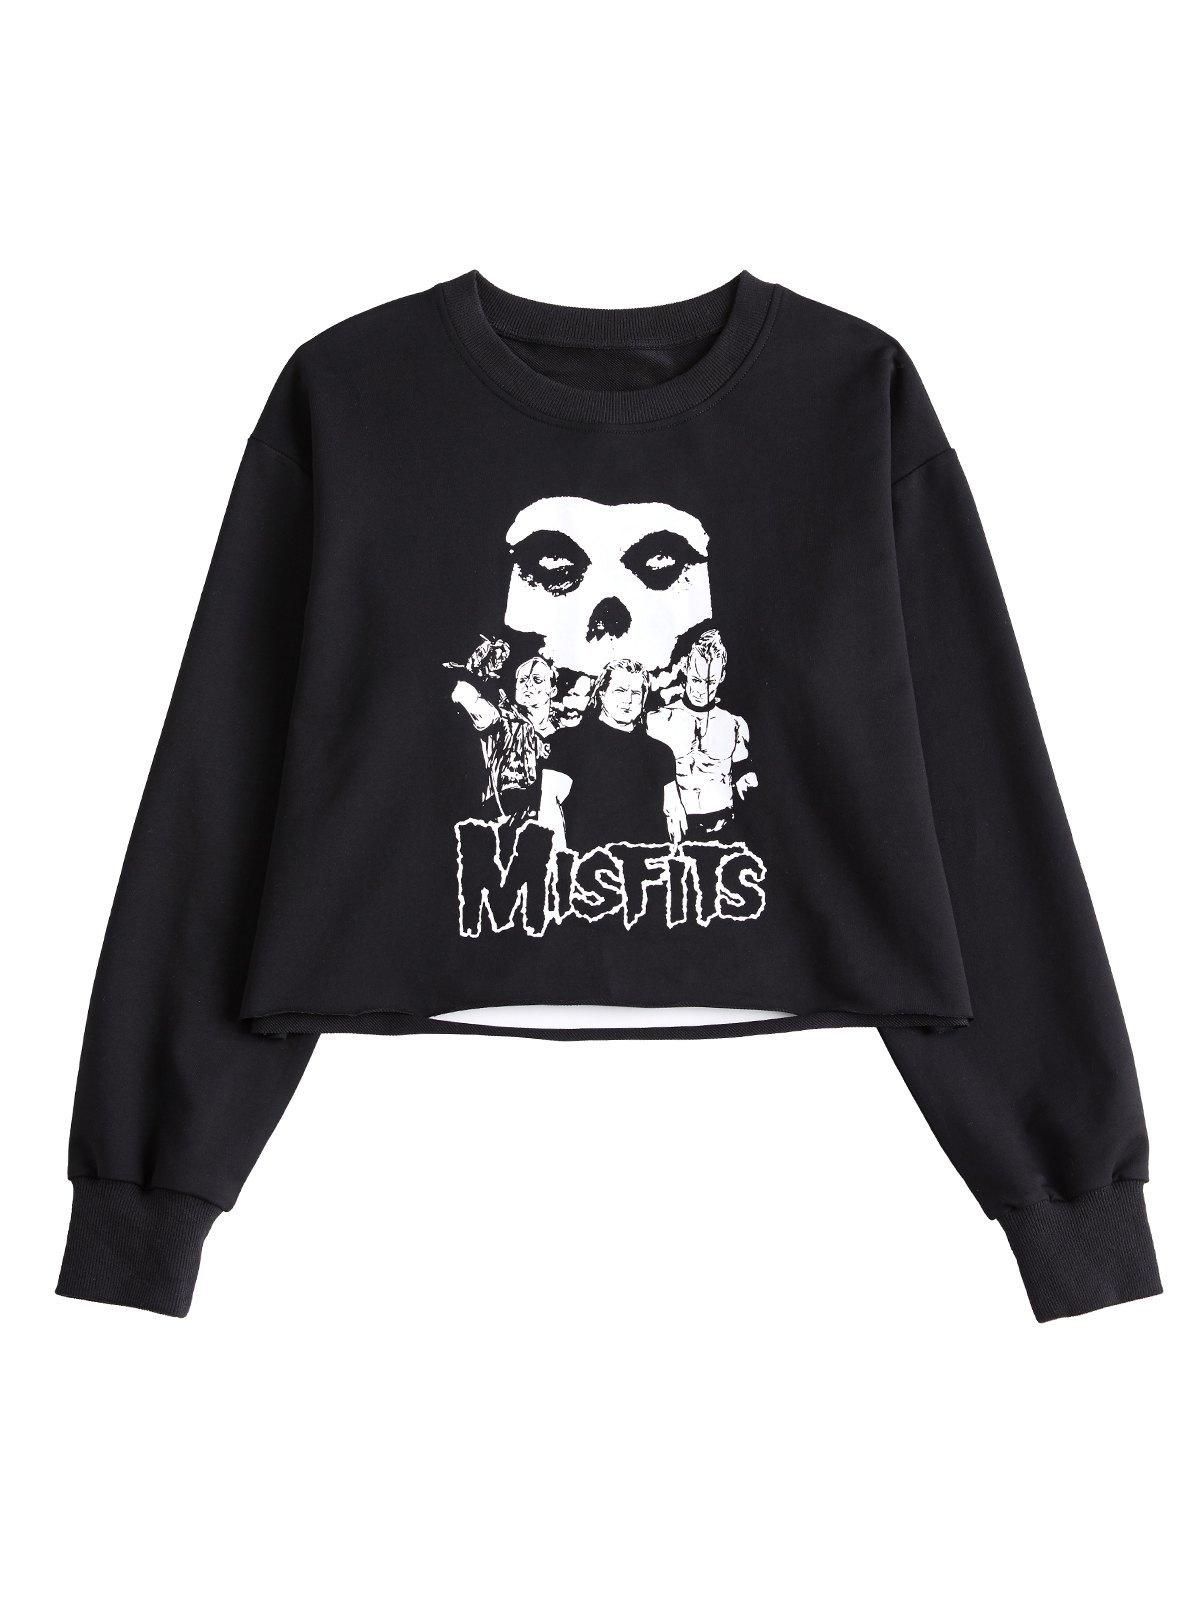 Comic Skull Print Sweatshirt - Black S